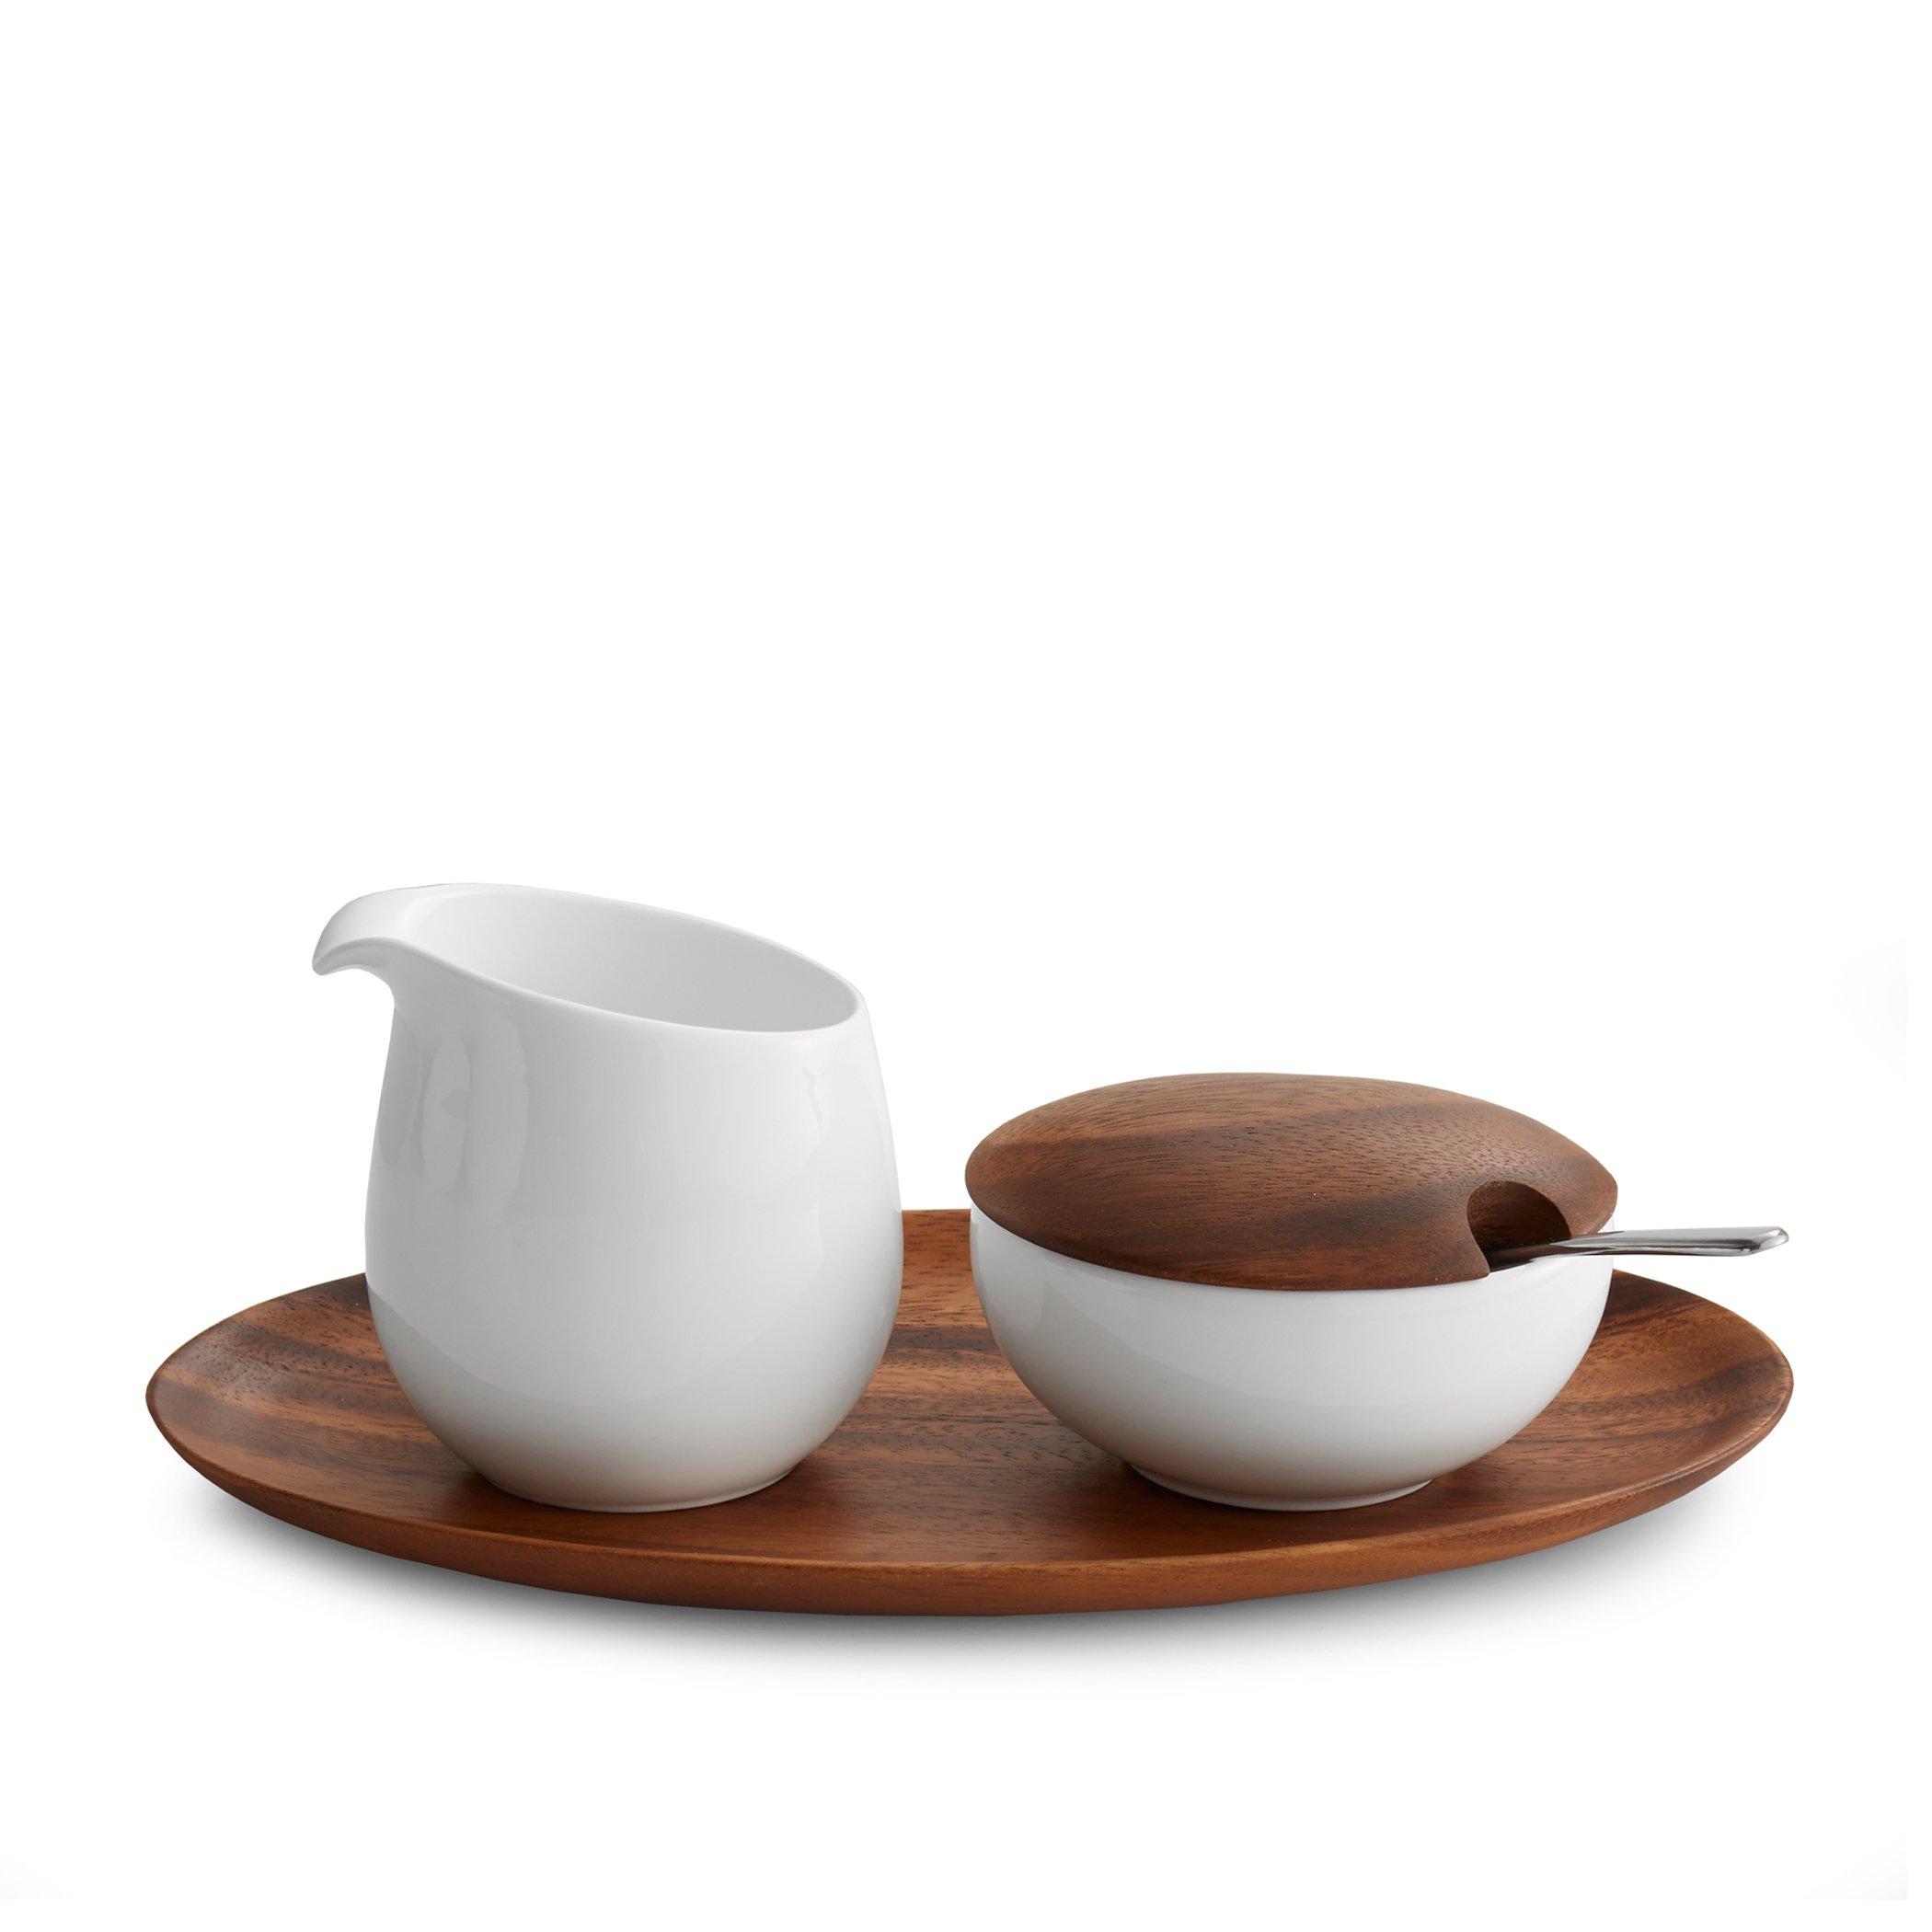 Nambé MT0866 Skye Sugar Creamer Set, Bowl: 4.5'' L x 3'' W x 2.75'' H, (1) Pitcher: 3.5'' L x 2.75'' W x 4'' H, (1) Serving Tray: 11.25'' L x 5.25'' W x 0.75'' H, White by Nambé (Image #1)